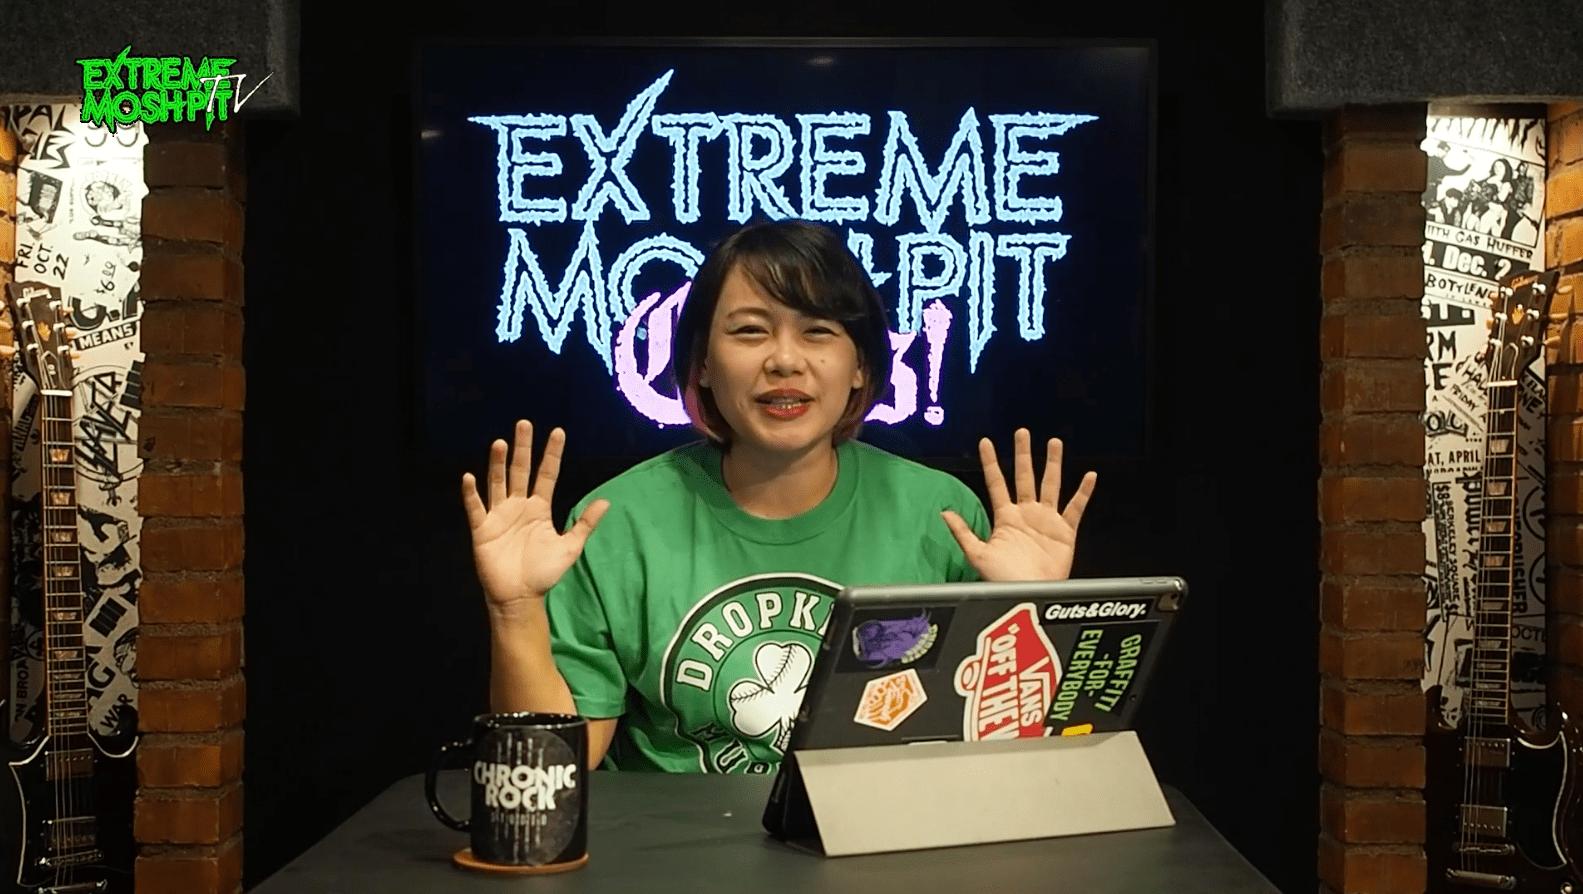 Extreme Moshpit